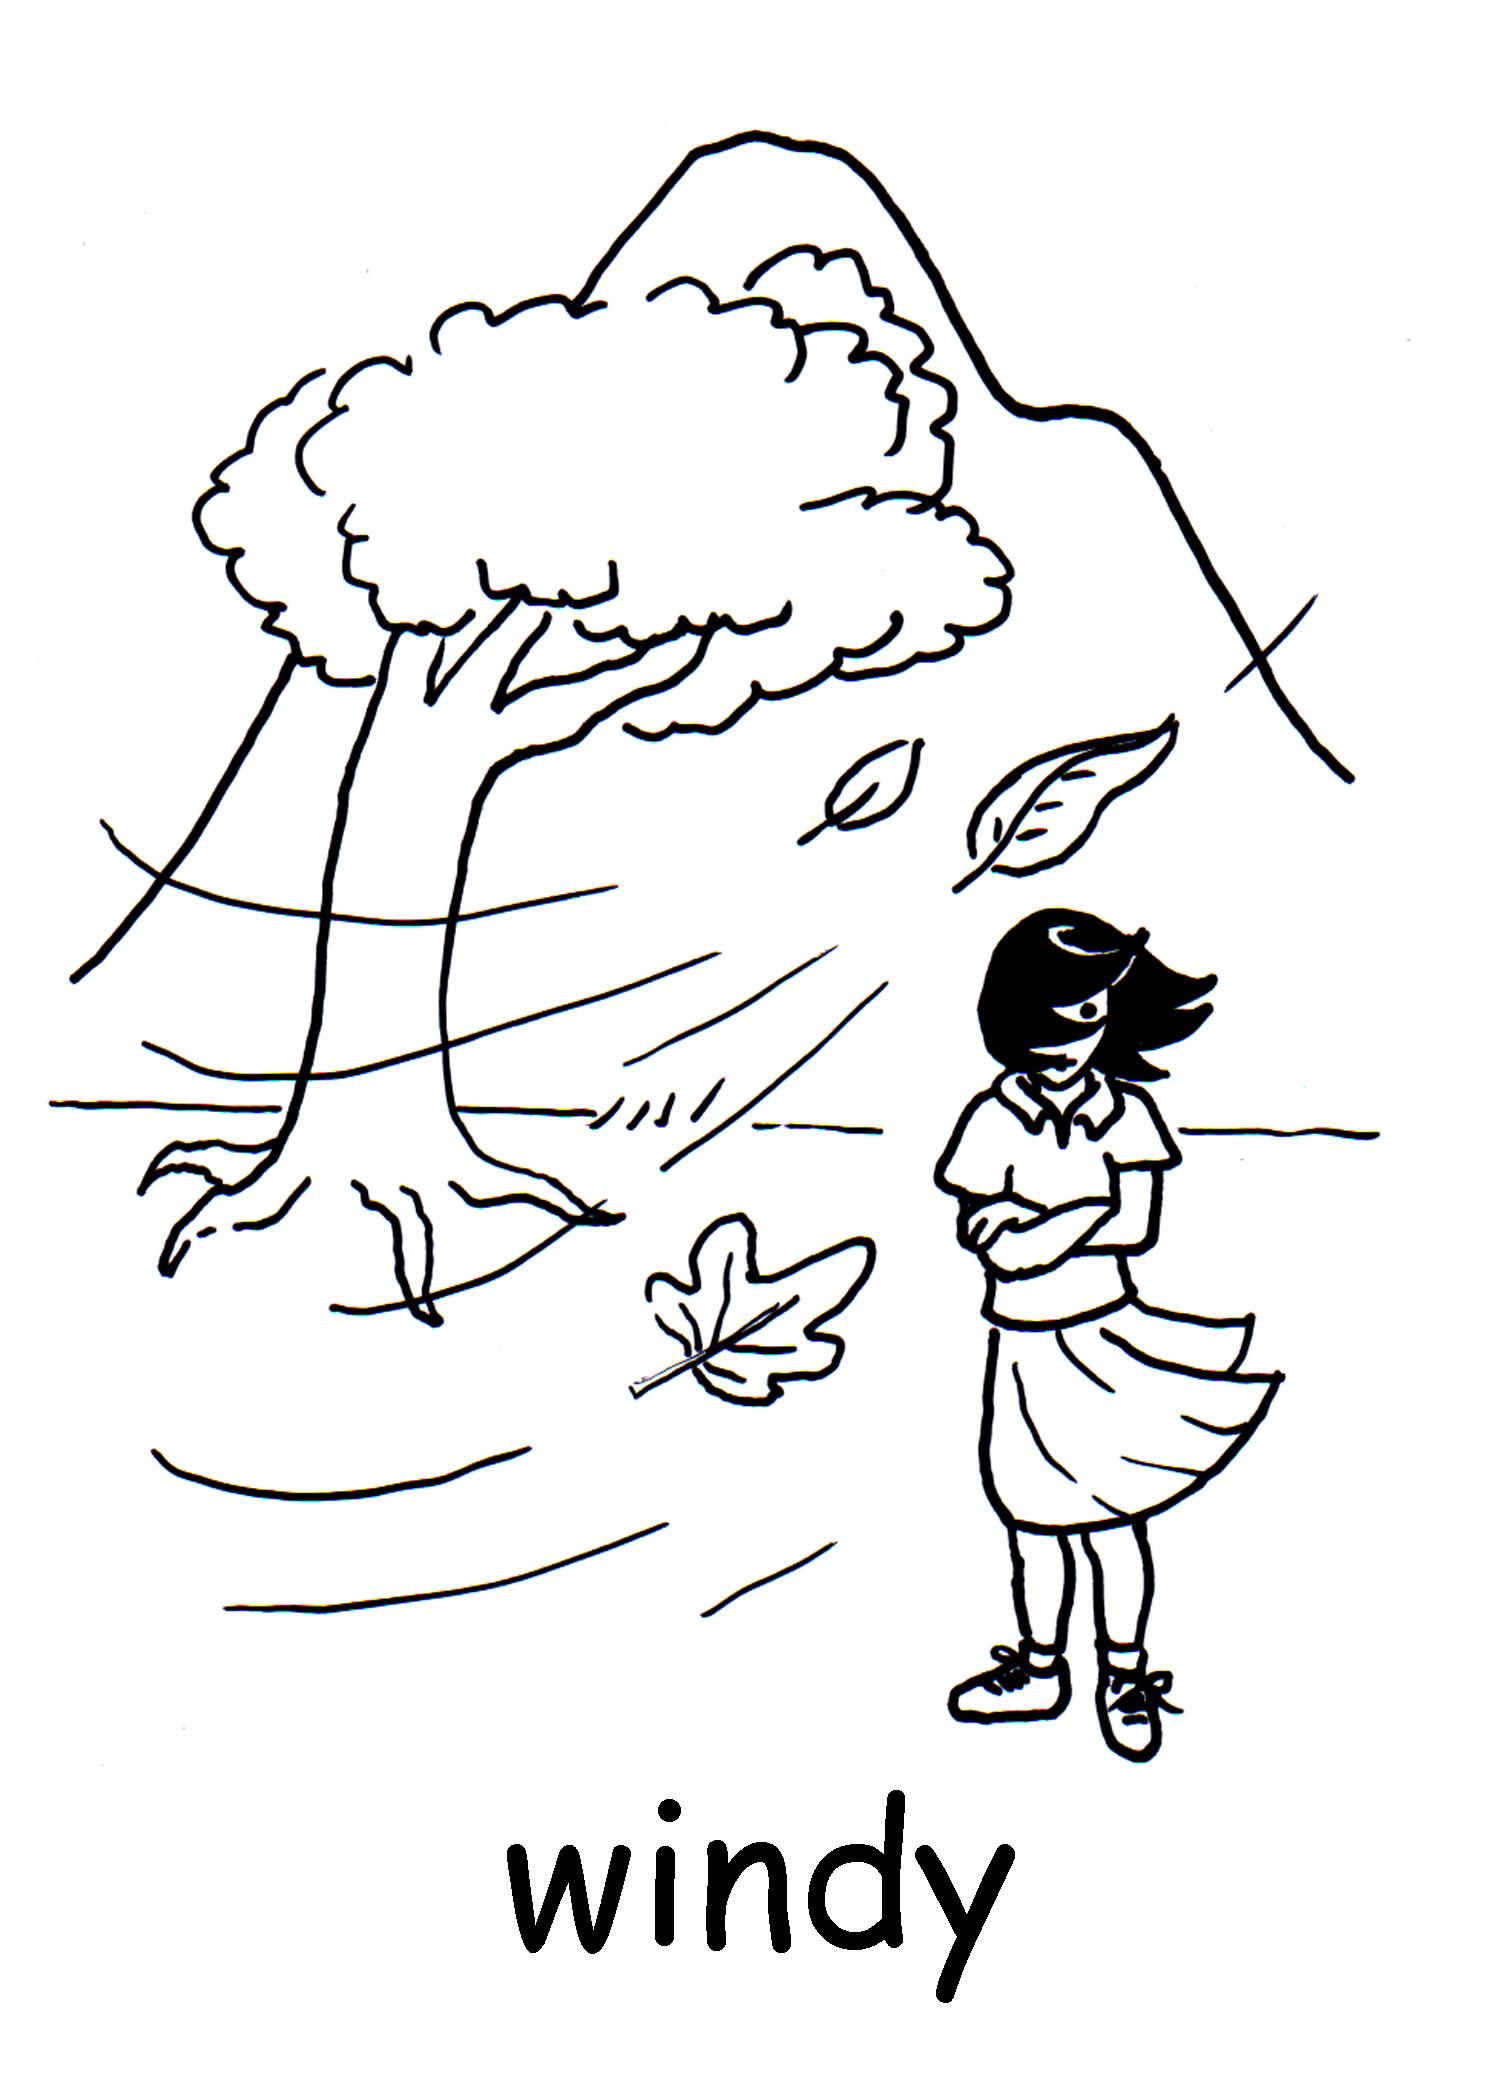 Wind Vocabulary Worksheet